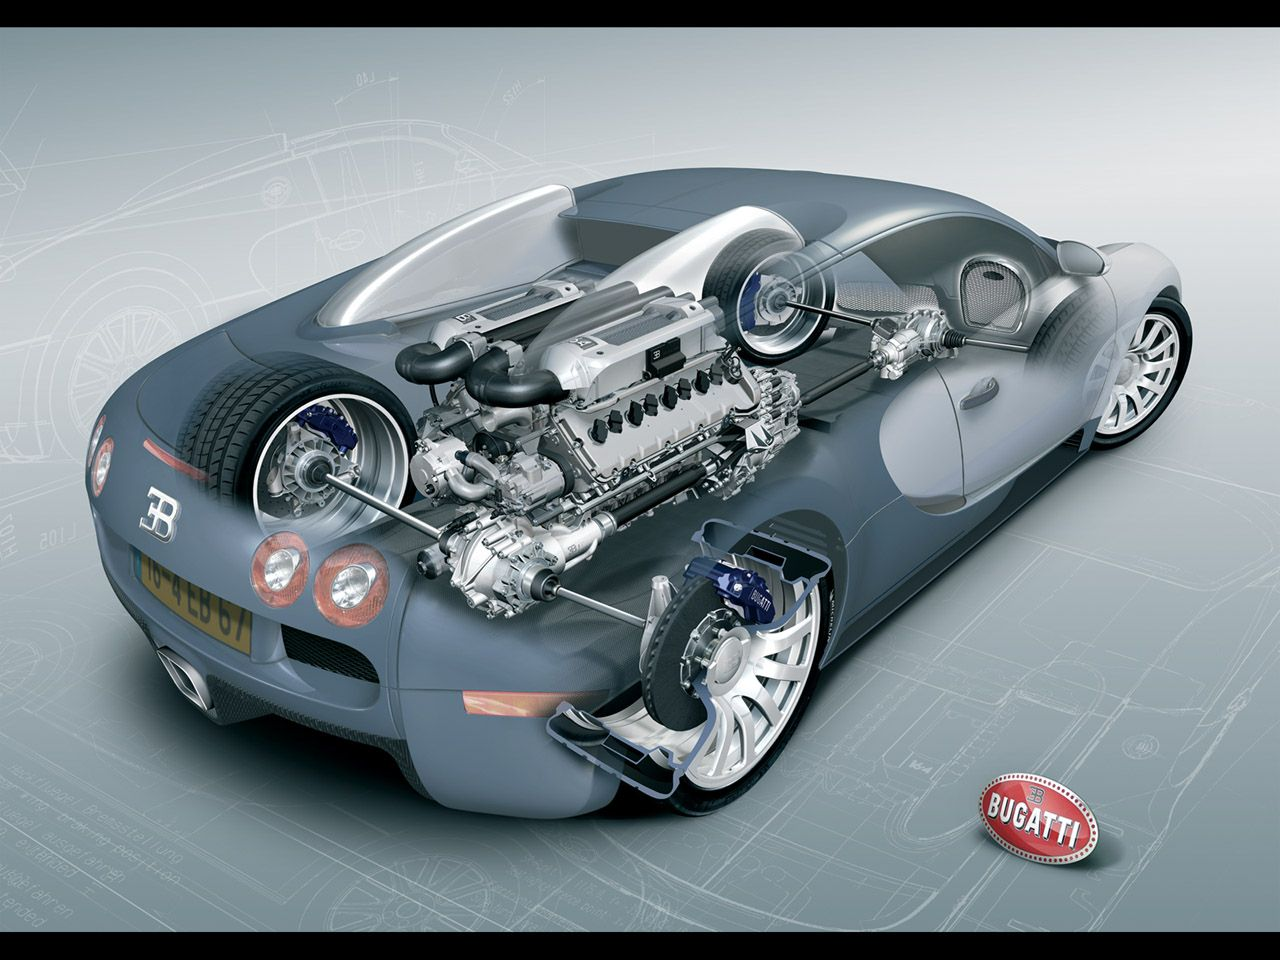 bugatti veyron   Super Cars   Pinterest   Bugatti veyron, Engine and ...